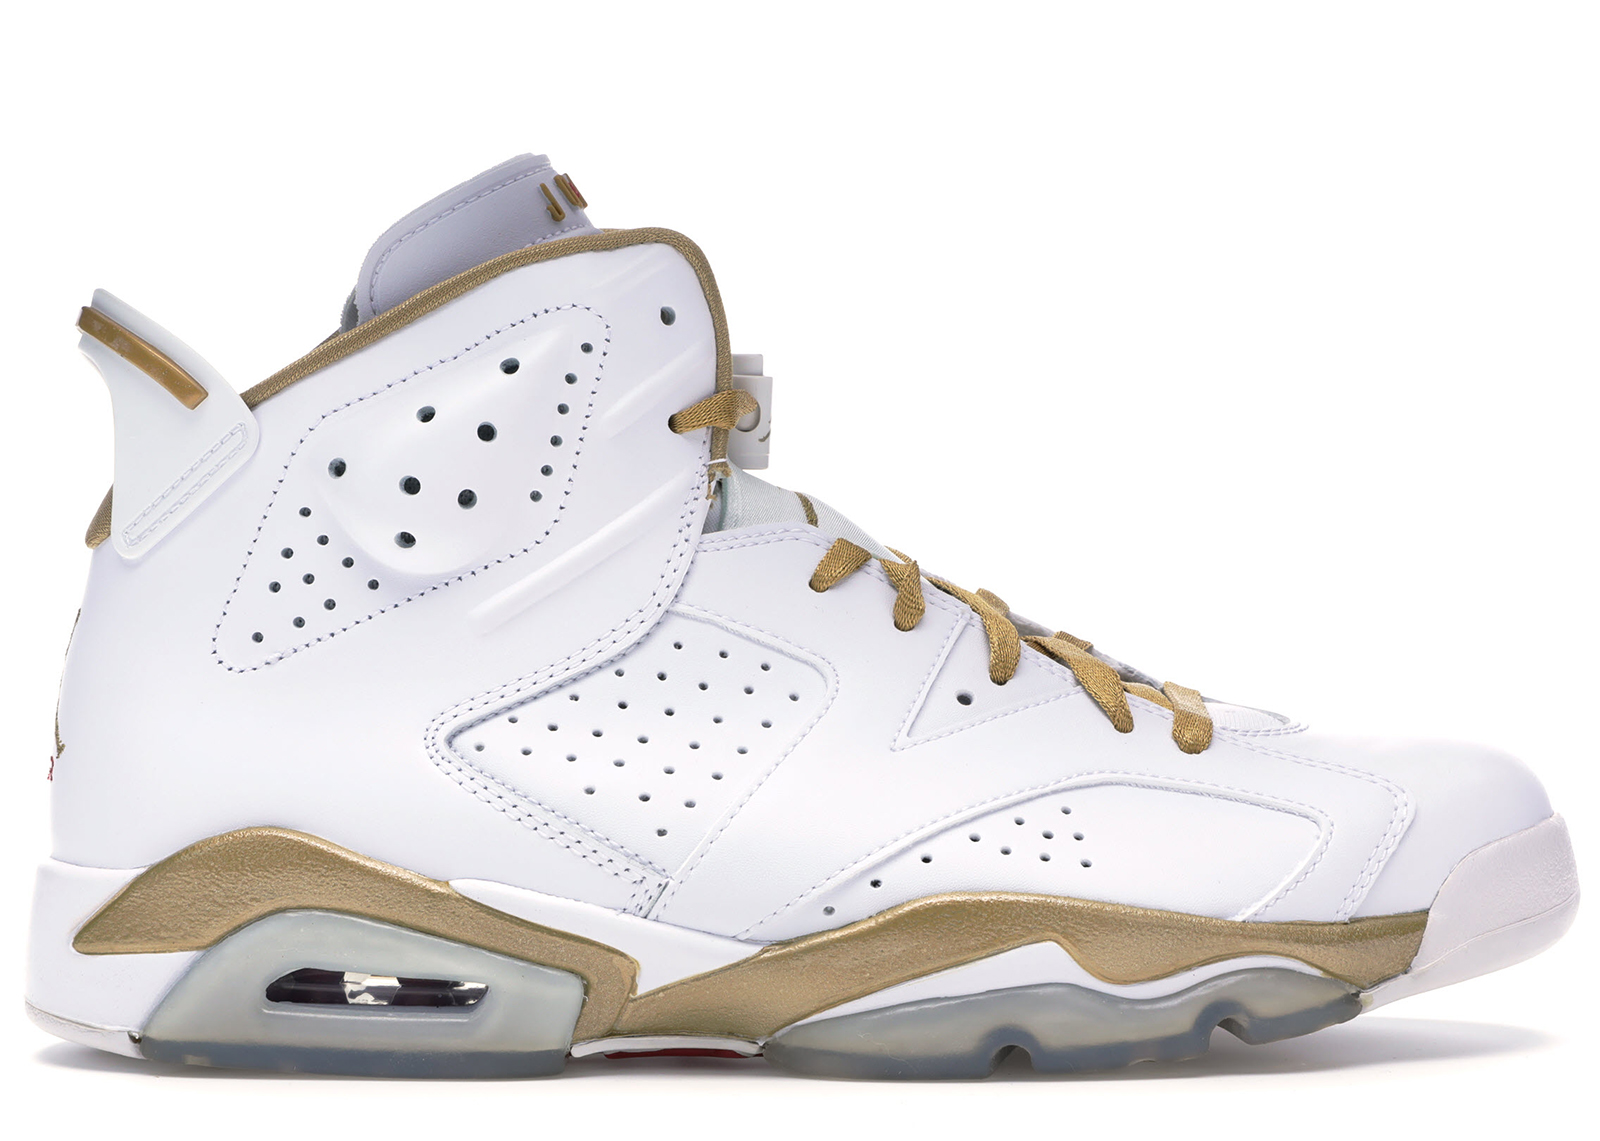 Jordan 6 Retro Golden Moments Pack (6